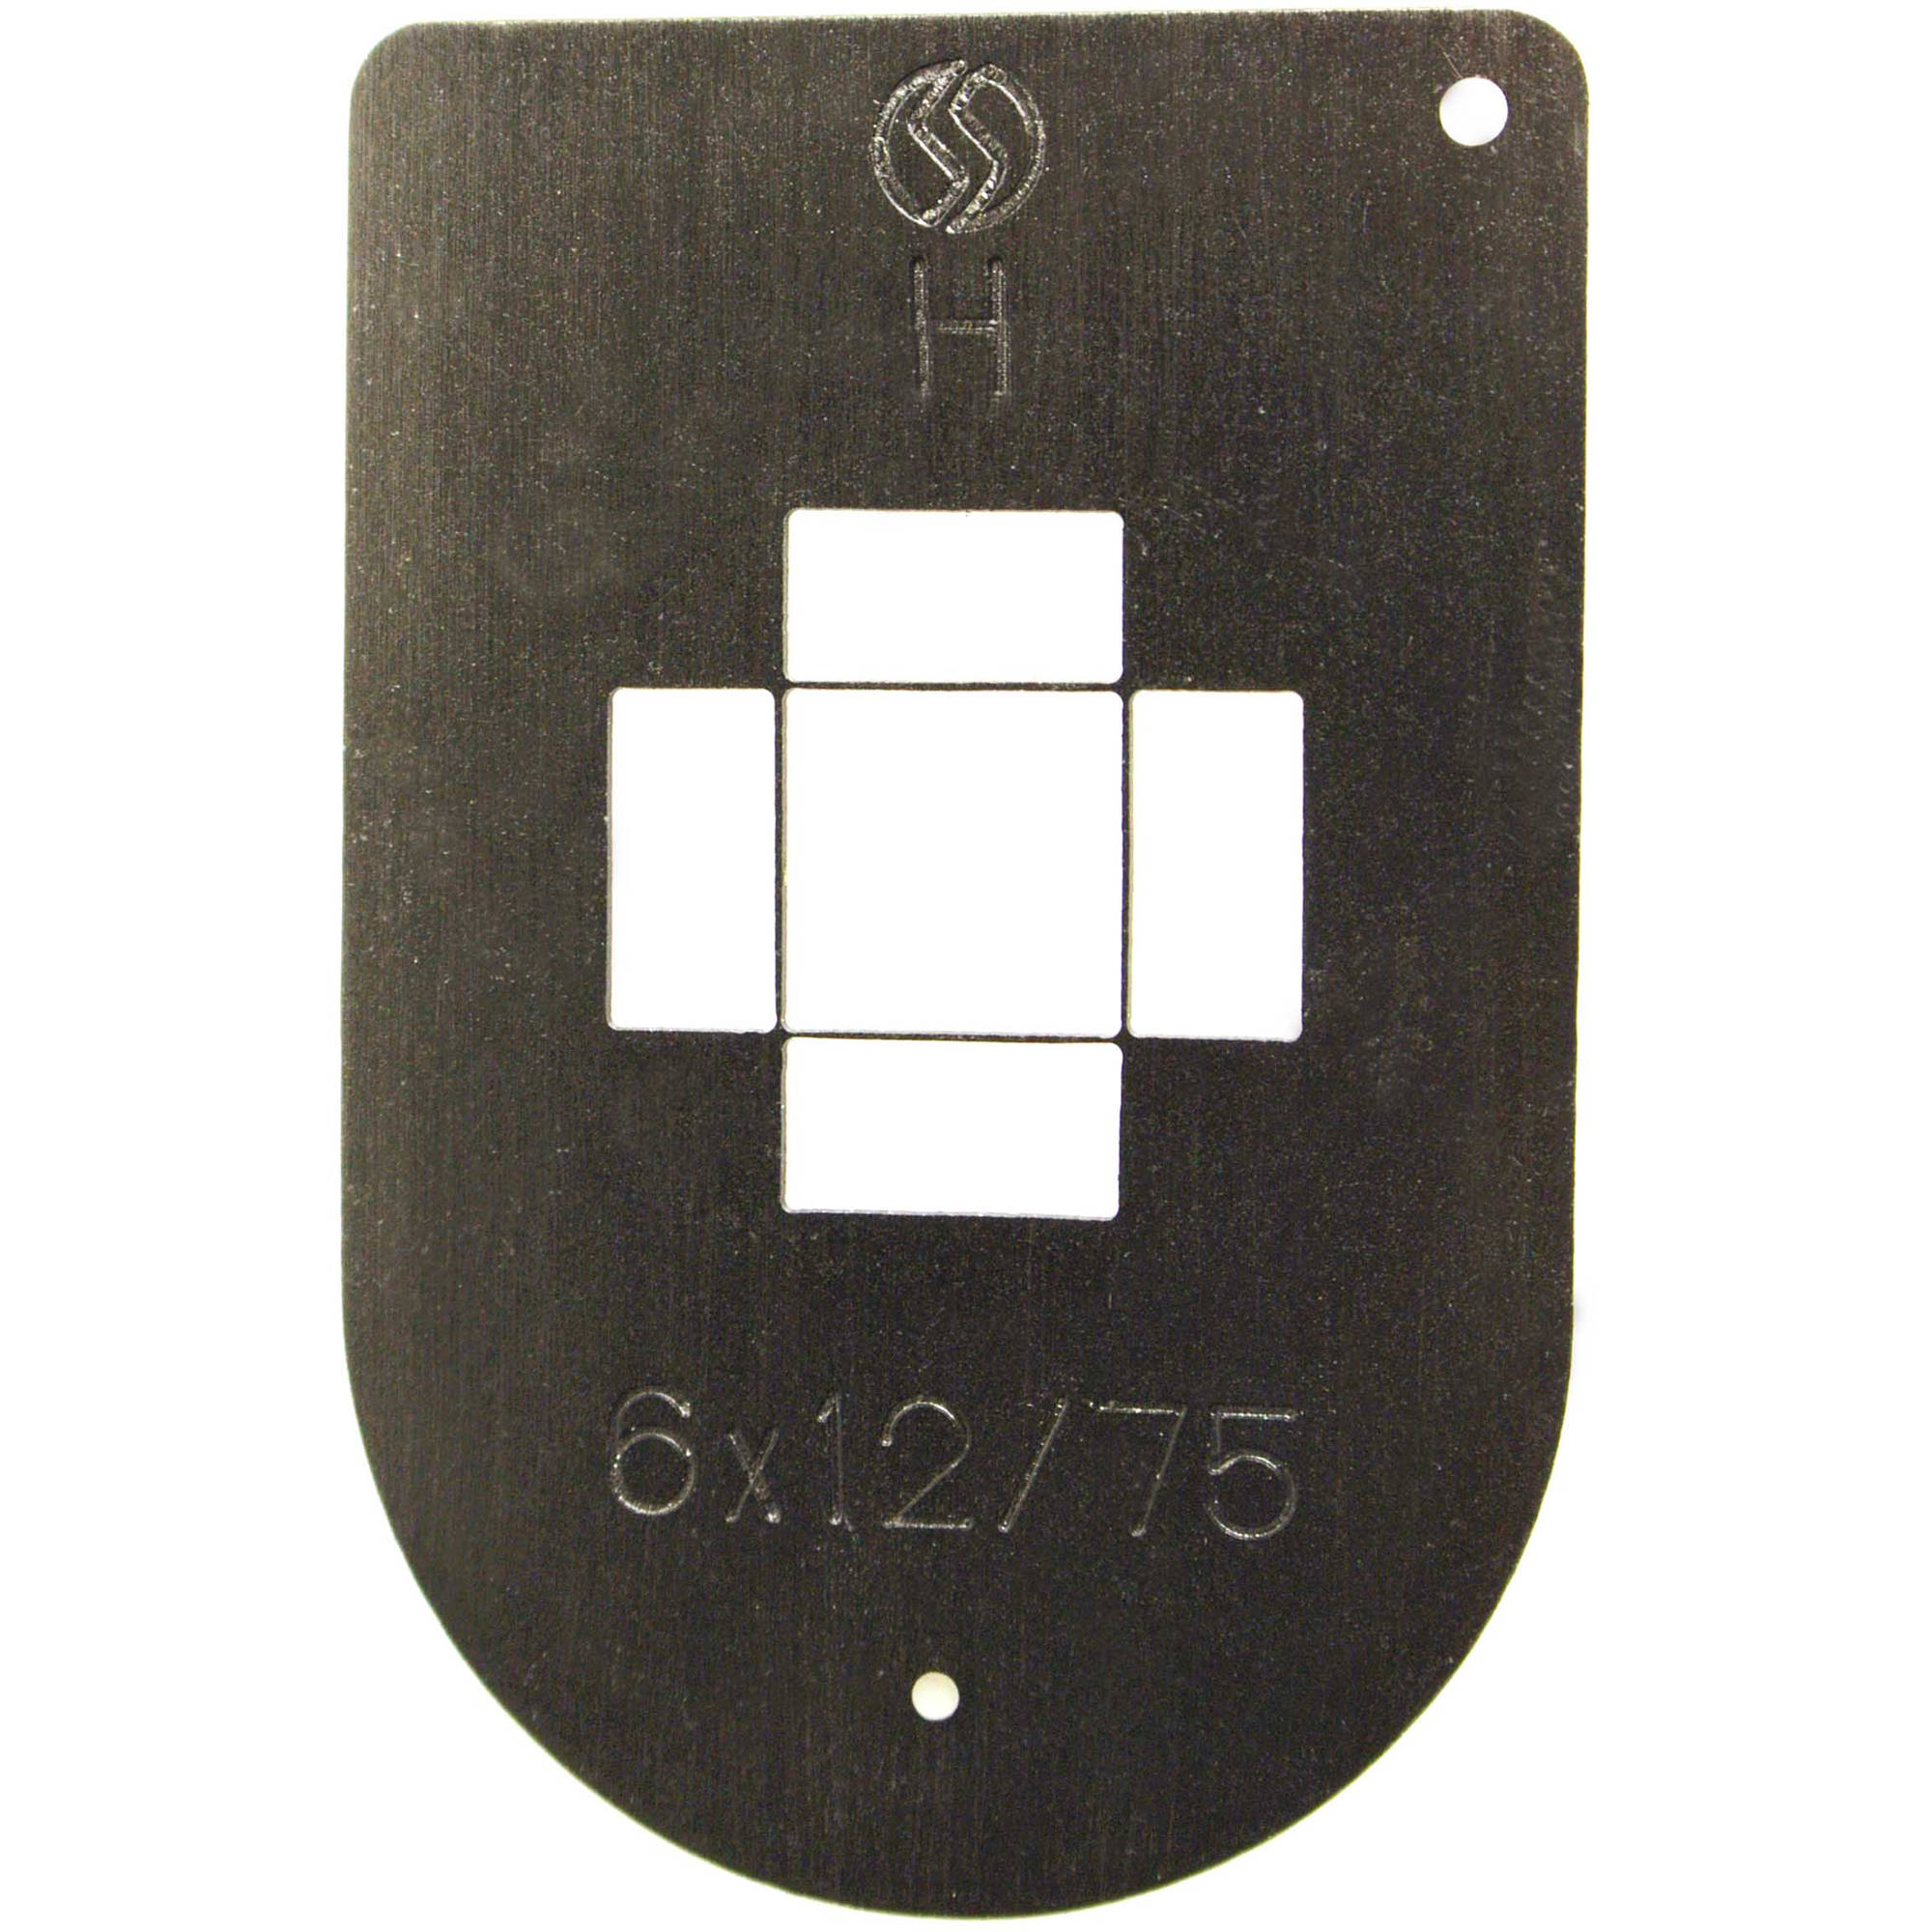 Silvestri 6 X 12 Viewfinder Frame For Silvestri H 1033 Bh